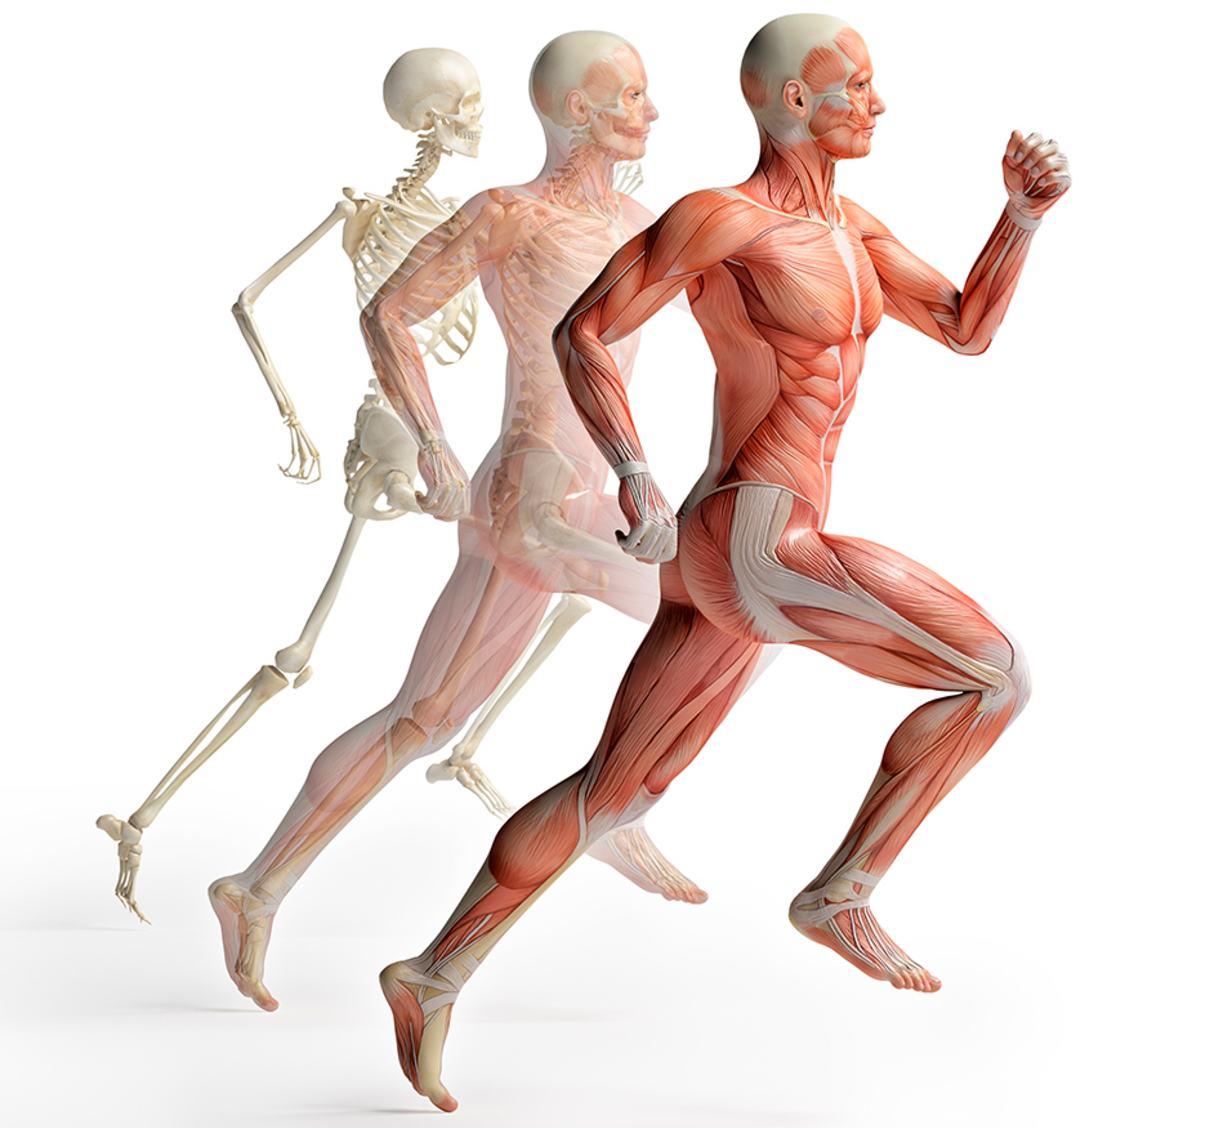 Beste Alle Muskeln Im Körper Bilder - Anatomie Ideen - finotti.info